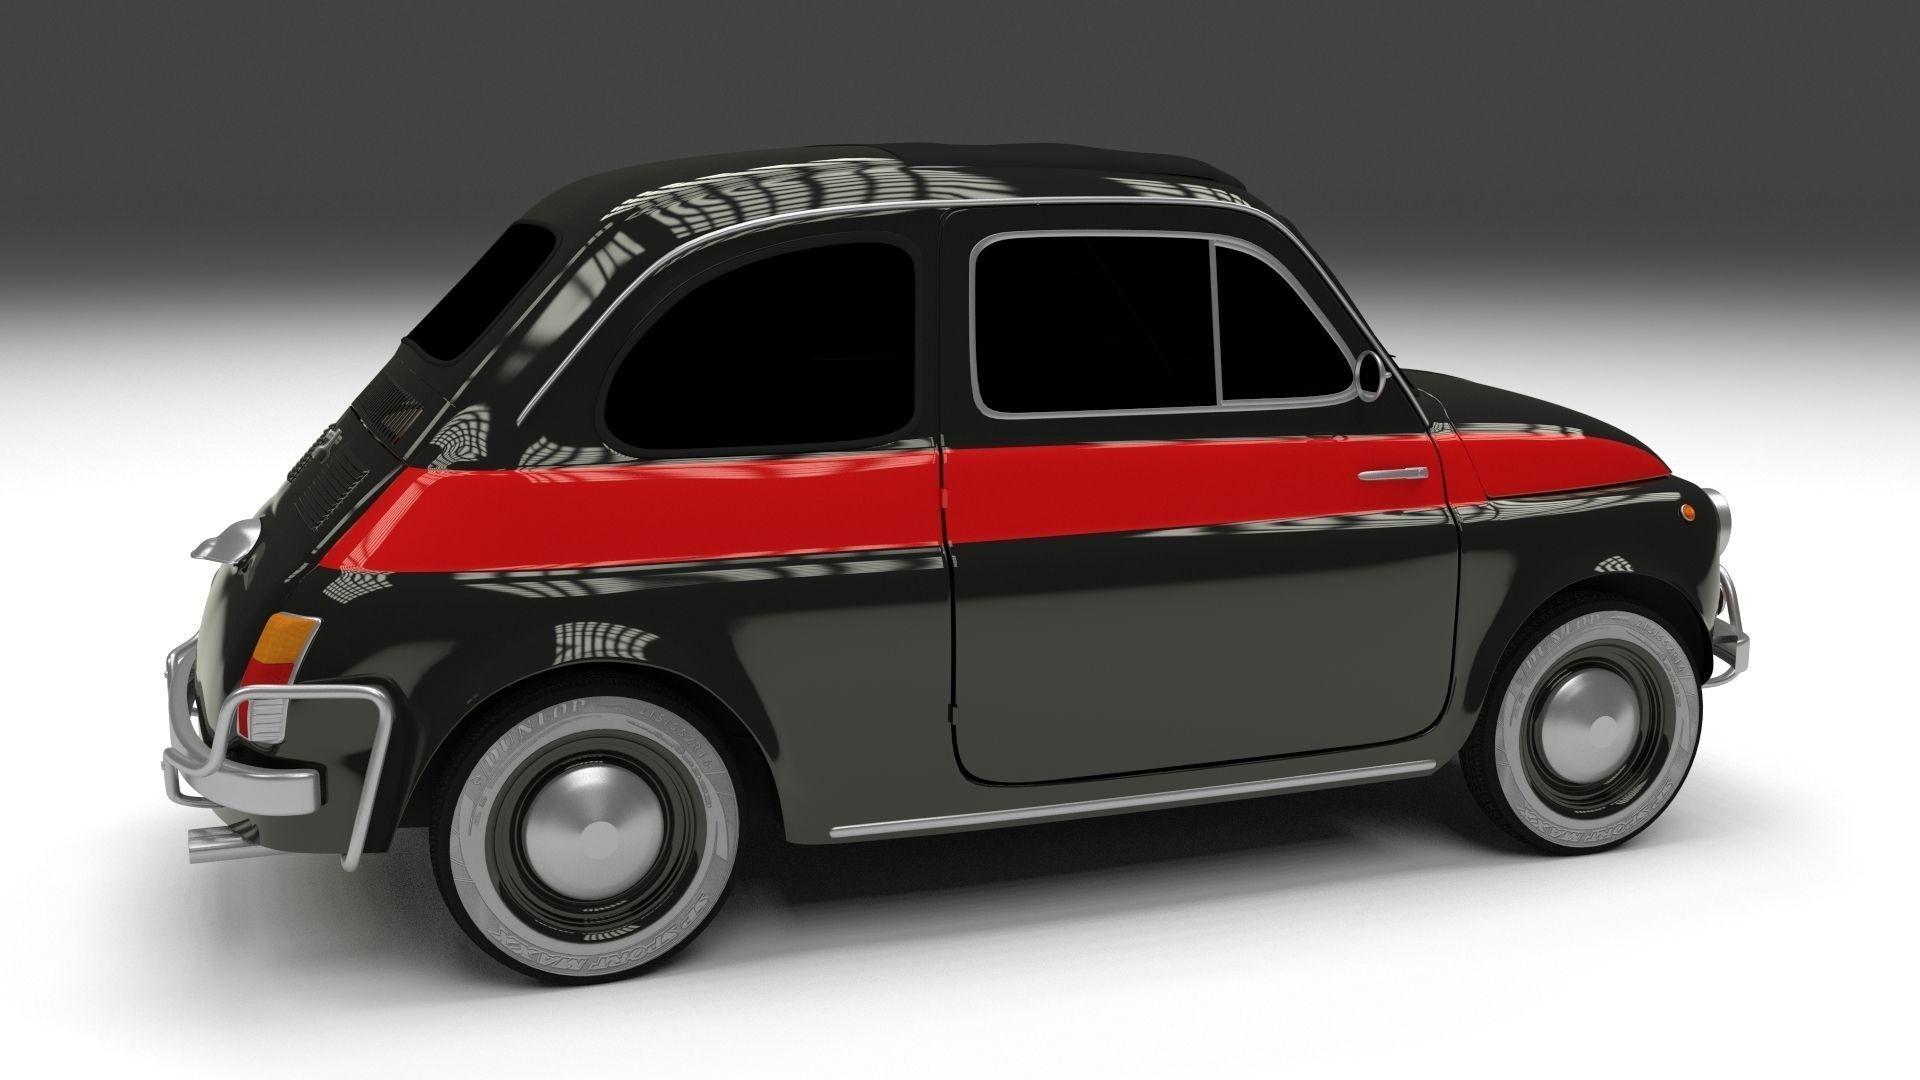 fiat 500 nuova sport 1958 hdri 3d model obj fbx stl blend dae. Black Bedroom Furniture Sets. Home Design Ideas